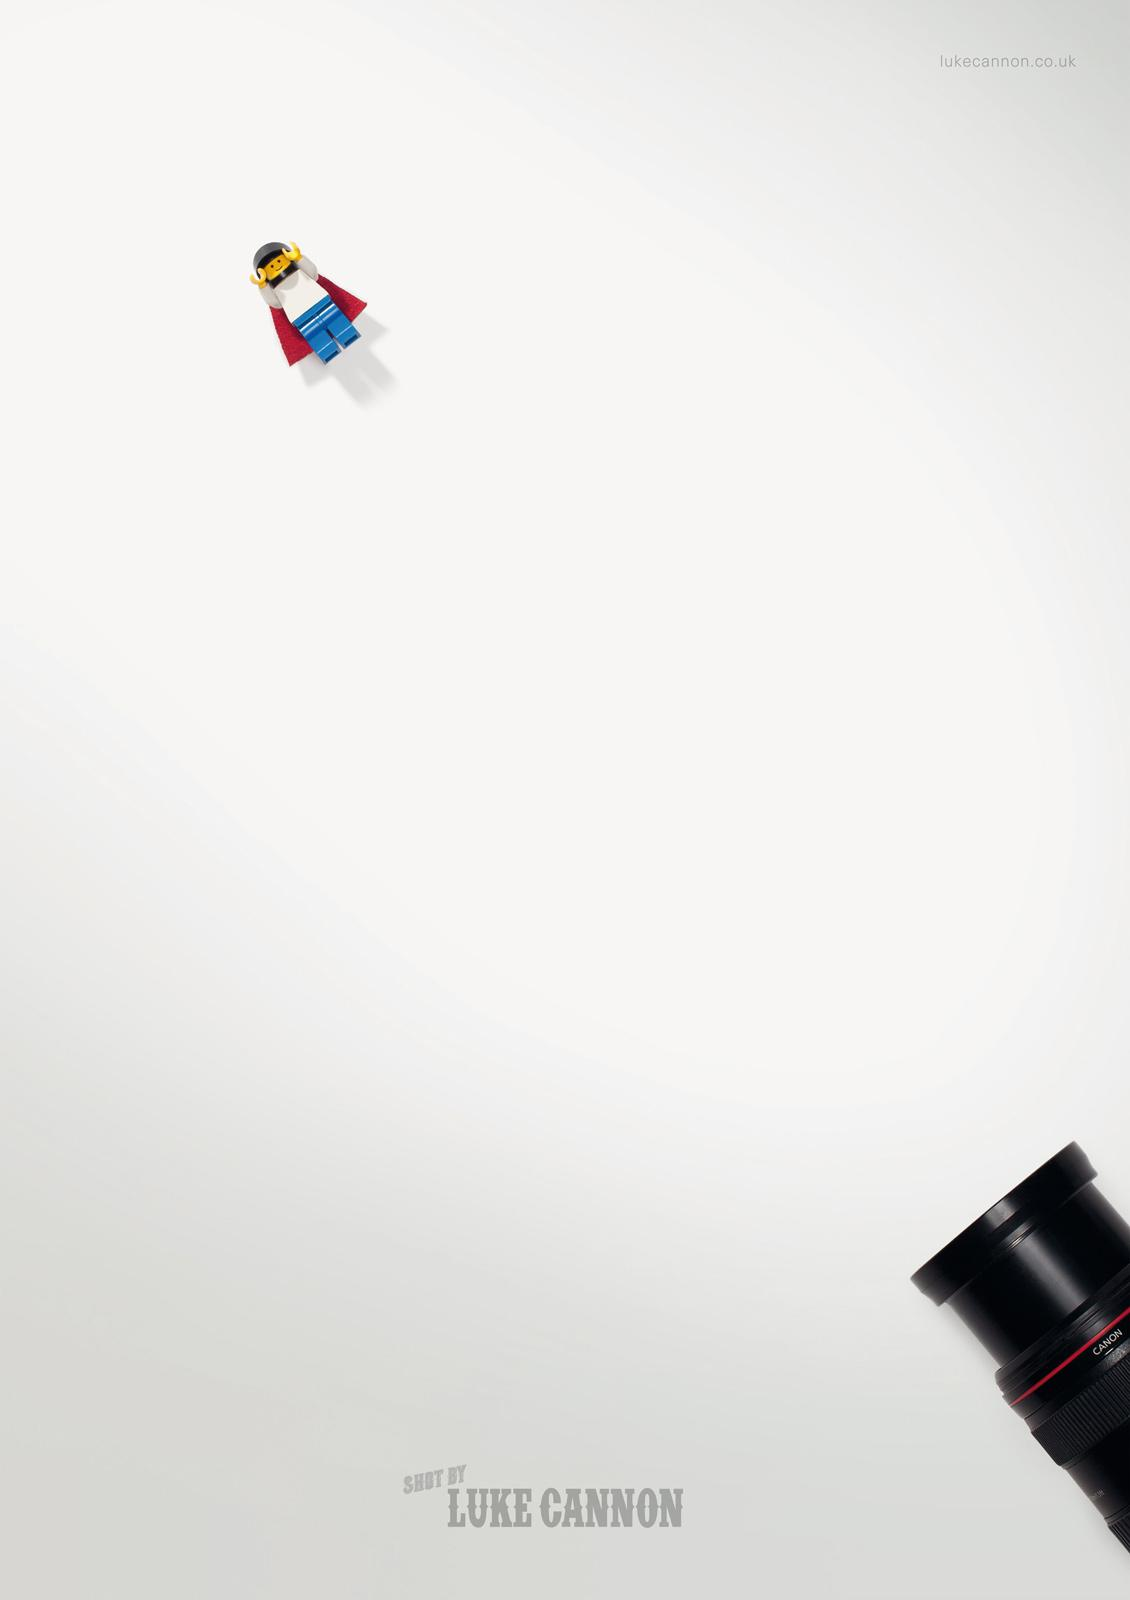 Luke Cannon Print Ad -  Cannonball Lego man